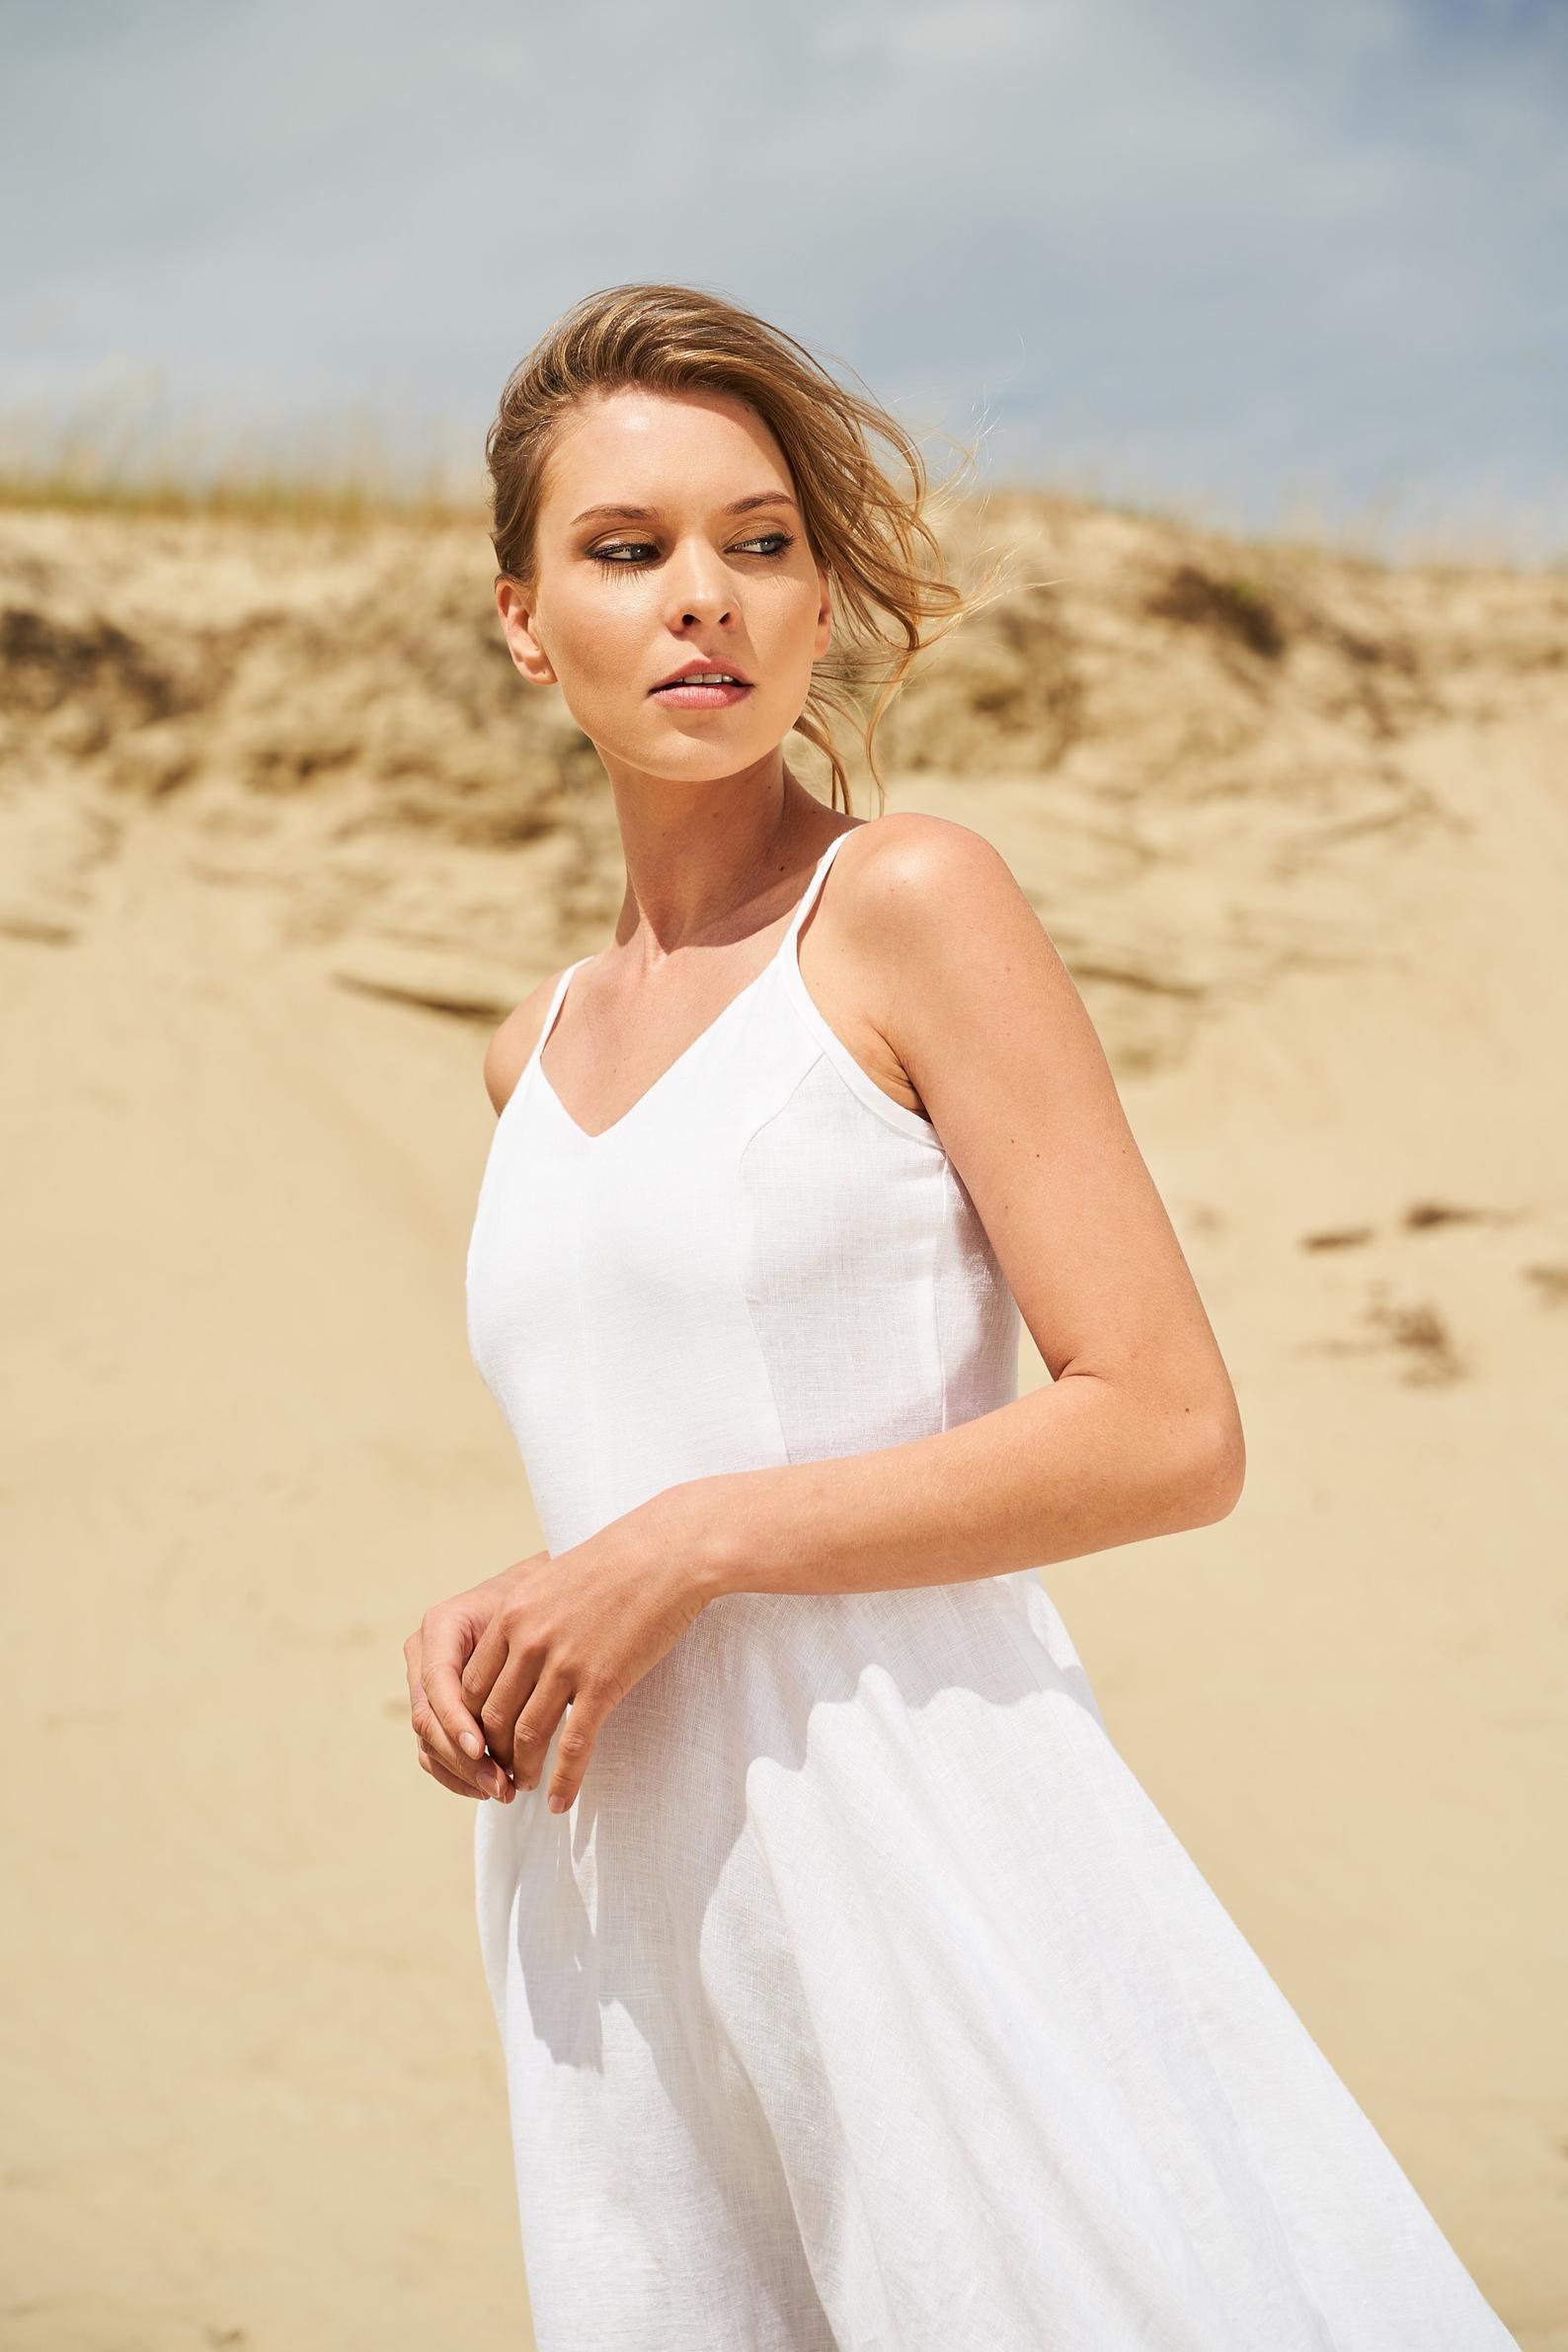 Maxi Linen Dress Odessa Linen Circle Dress With Spaghetti Straps Linen Wedding Dress Long White Linen Dress For Woman Occasion Dress Usados [ 2382 x 1588 Pixel ]